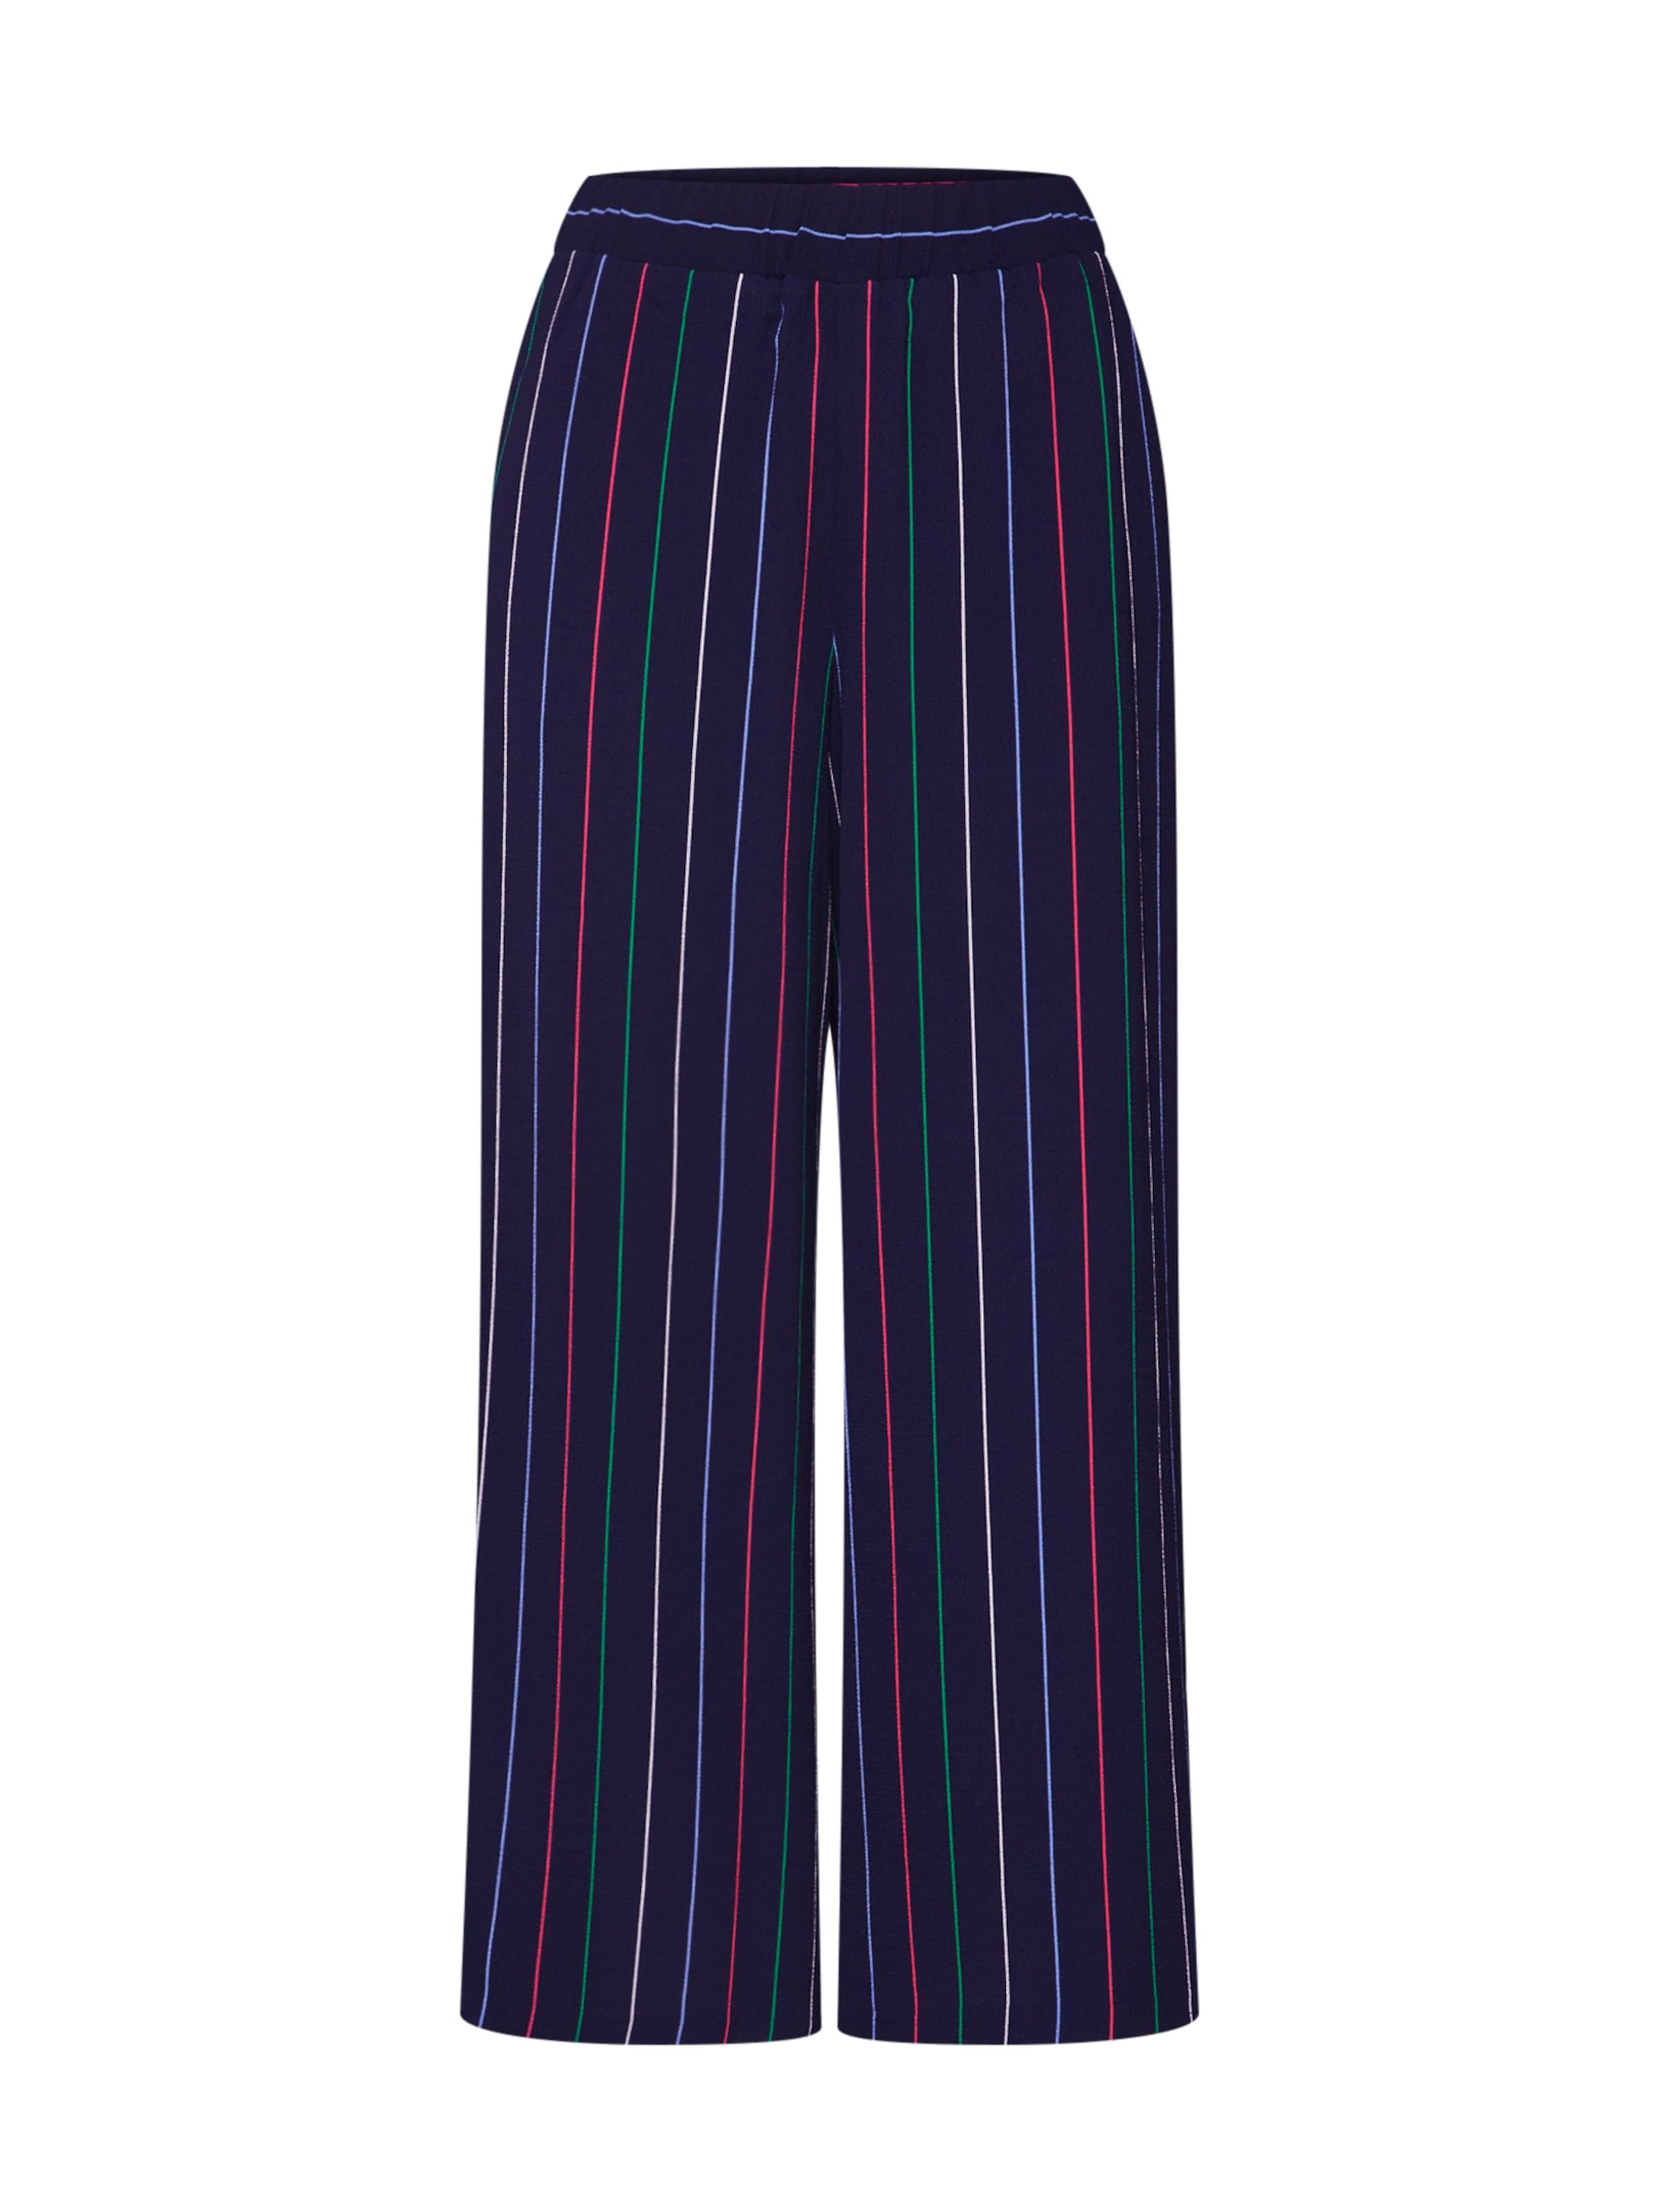 Bleu Tailor Denim Nuit Pantalon Tom En sthrQd